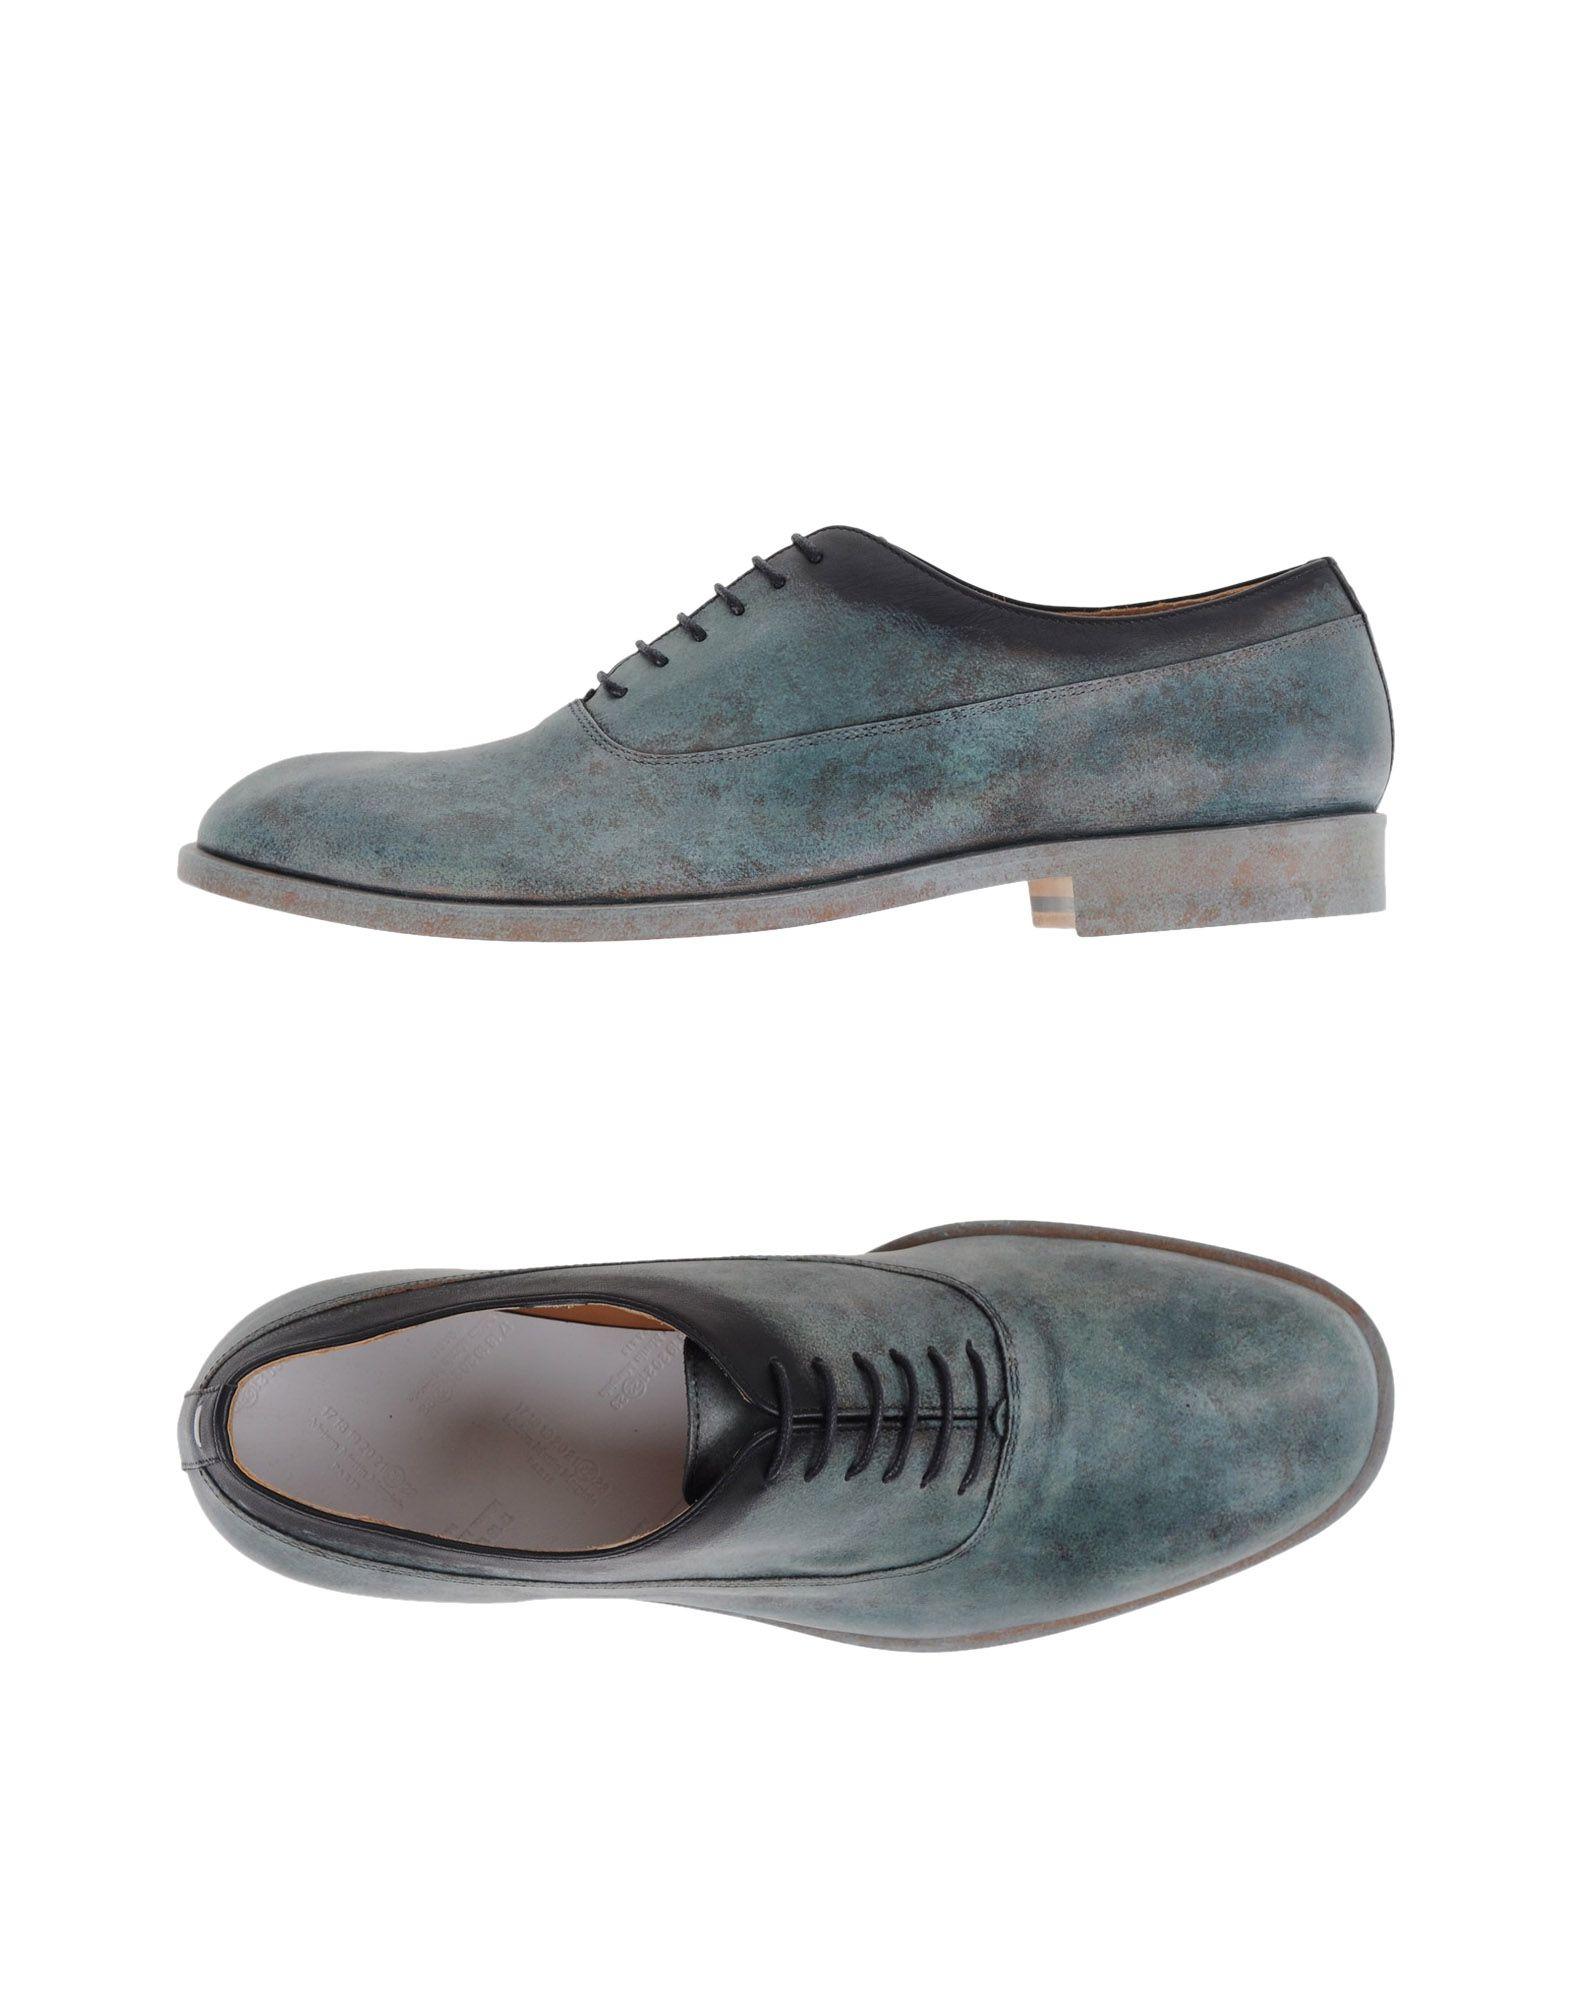 maison margiela lace up shoe for men lyst. Black Bedroom Furniture Sets. Home Design Ideas